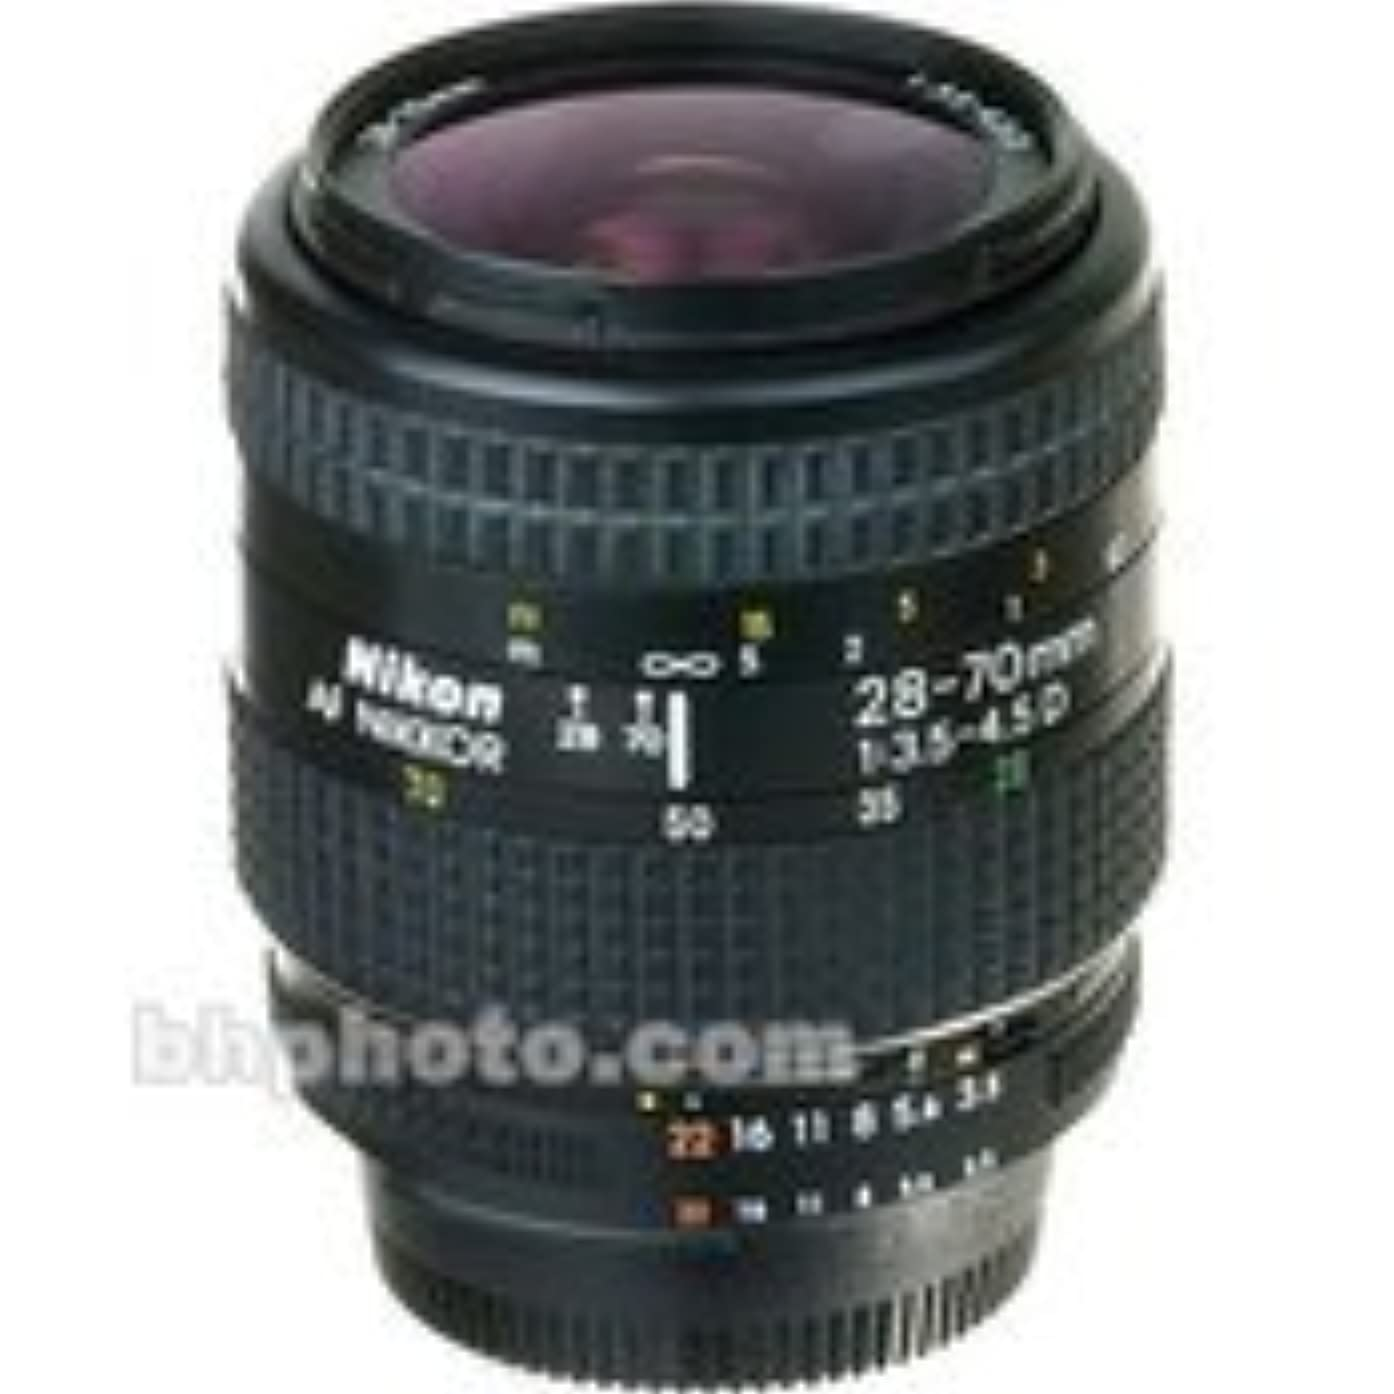 Nikon Nikkor AF 28-70mm f3.5-4.5D Macro Zoom